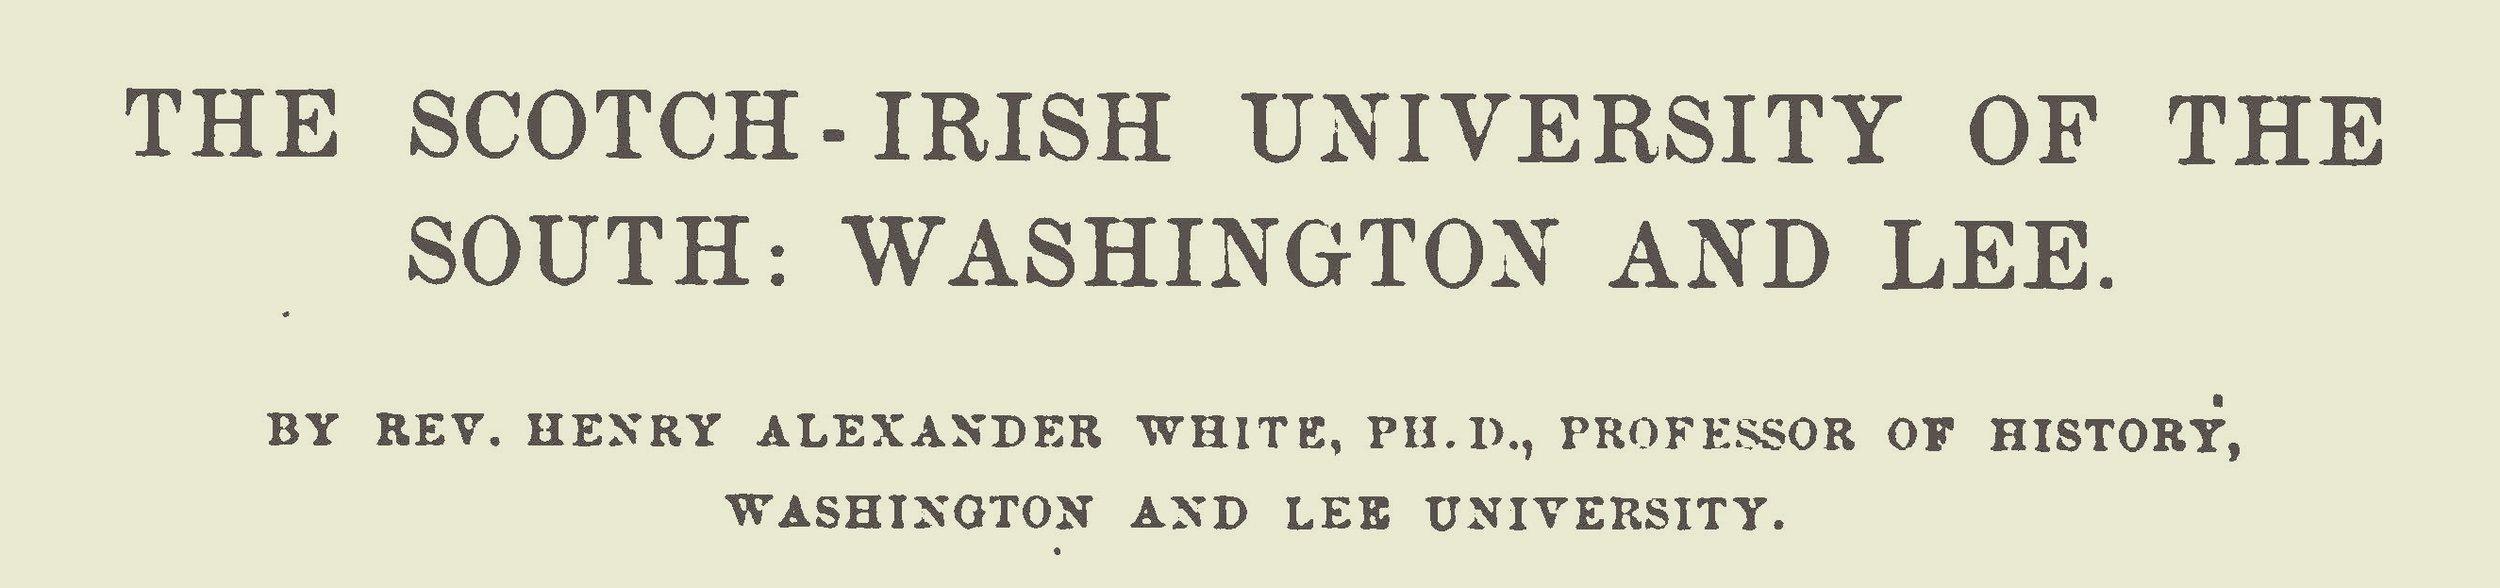 White, Henry Alexander, The Scotch-Irish University of the South Title Page.jpg